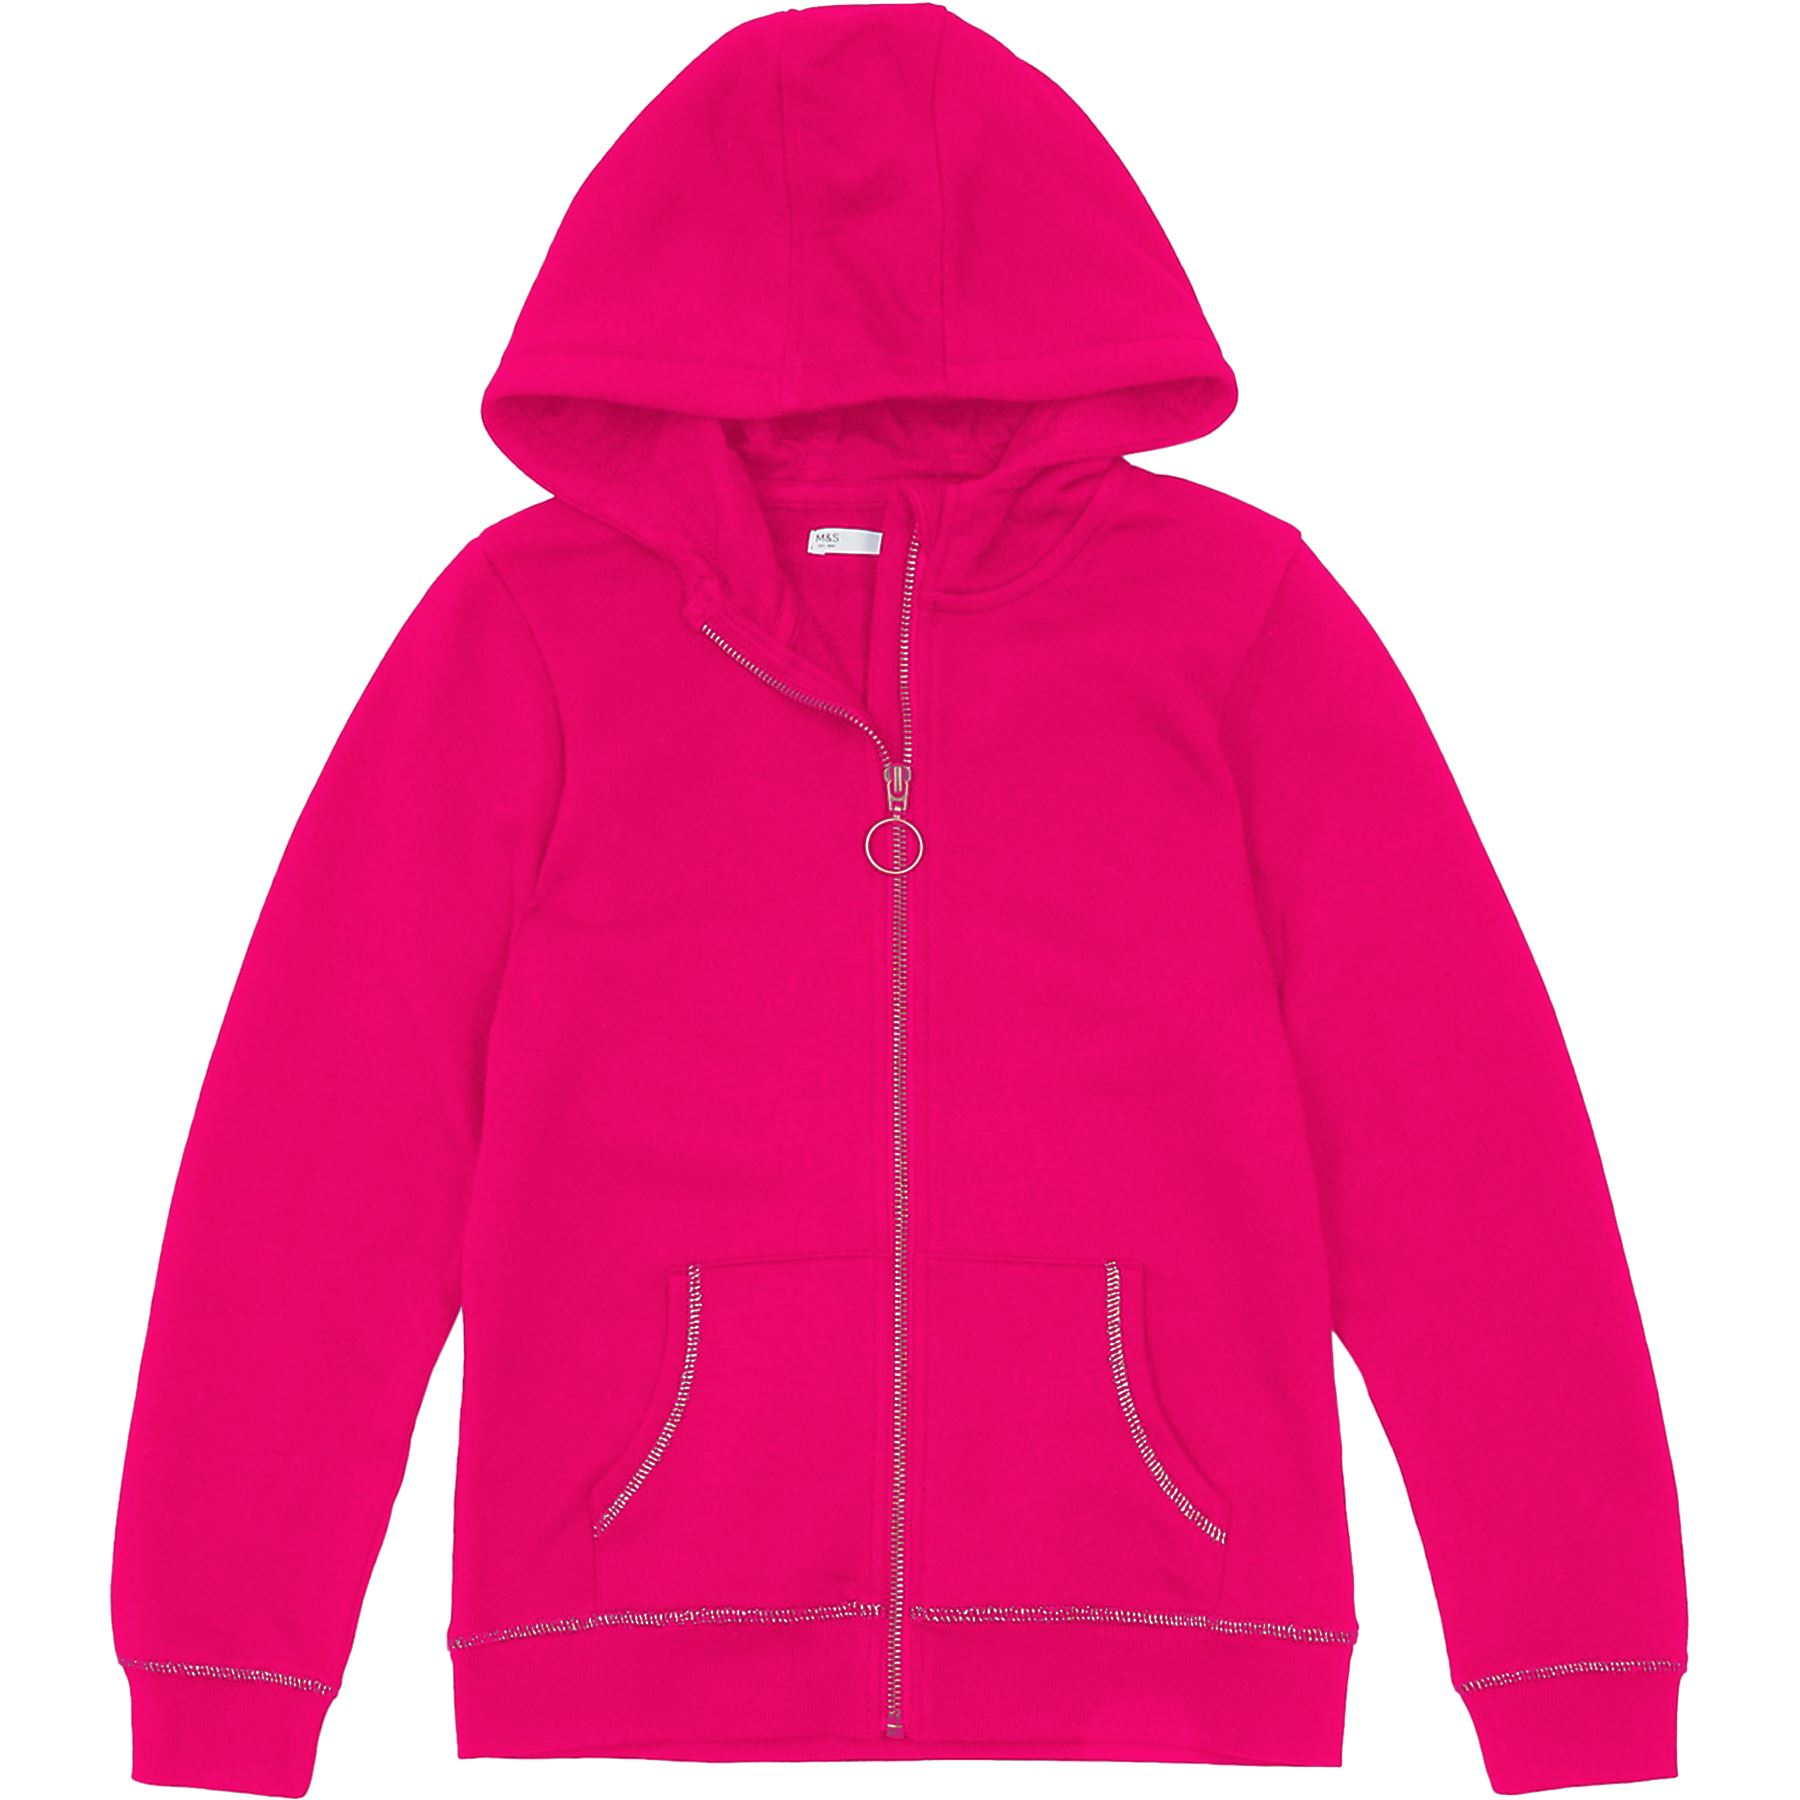 M/&S Kids Girls Zip Up Cotton Hoodie Sweat Shirt Tops Plain Hooded Jumpers Hoody